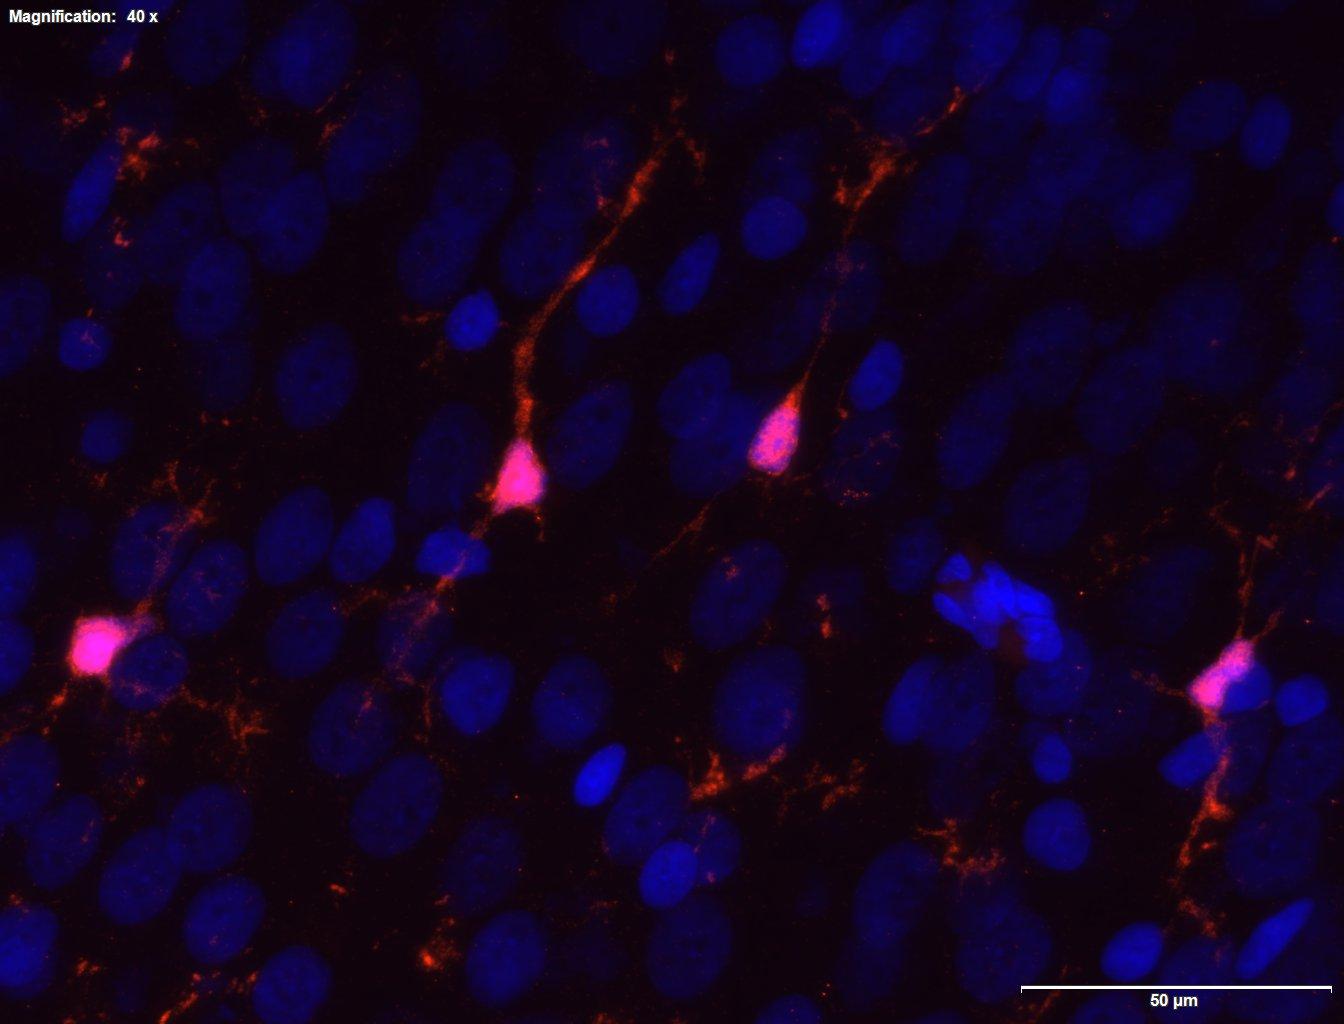 Policing the neural night club: microglia